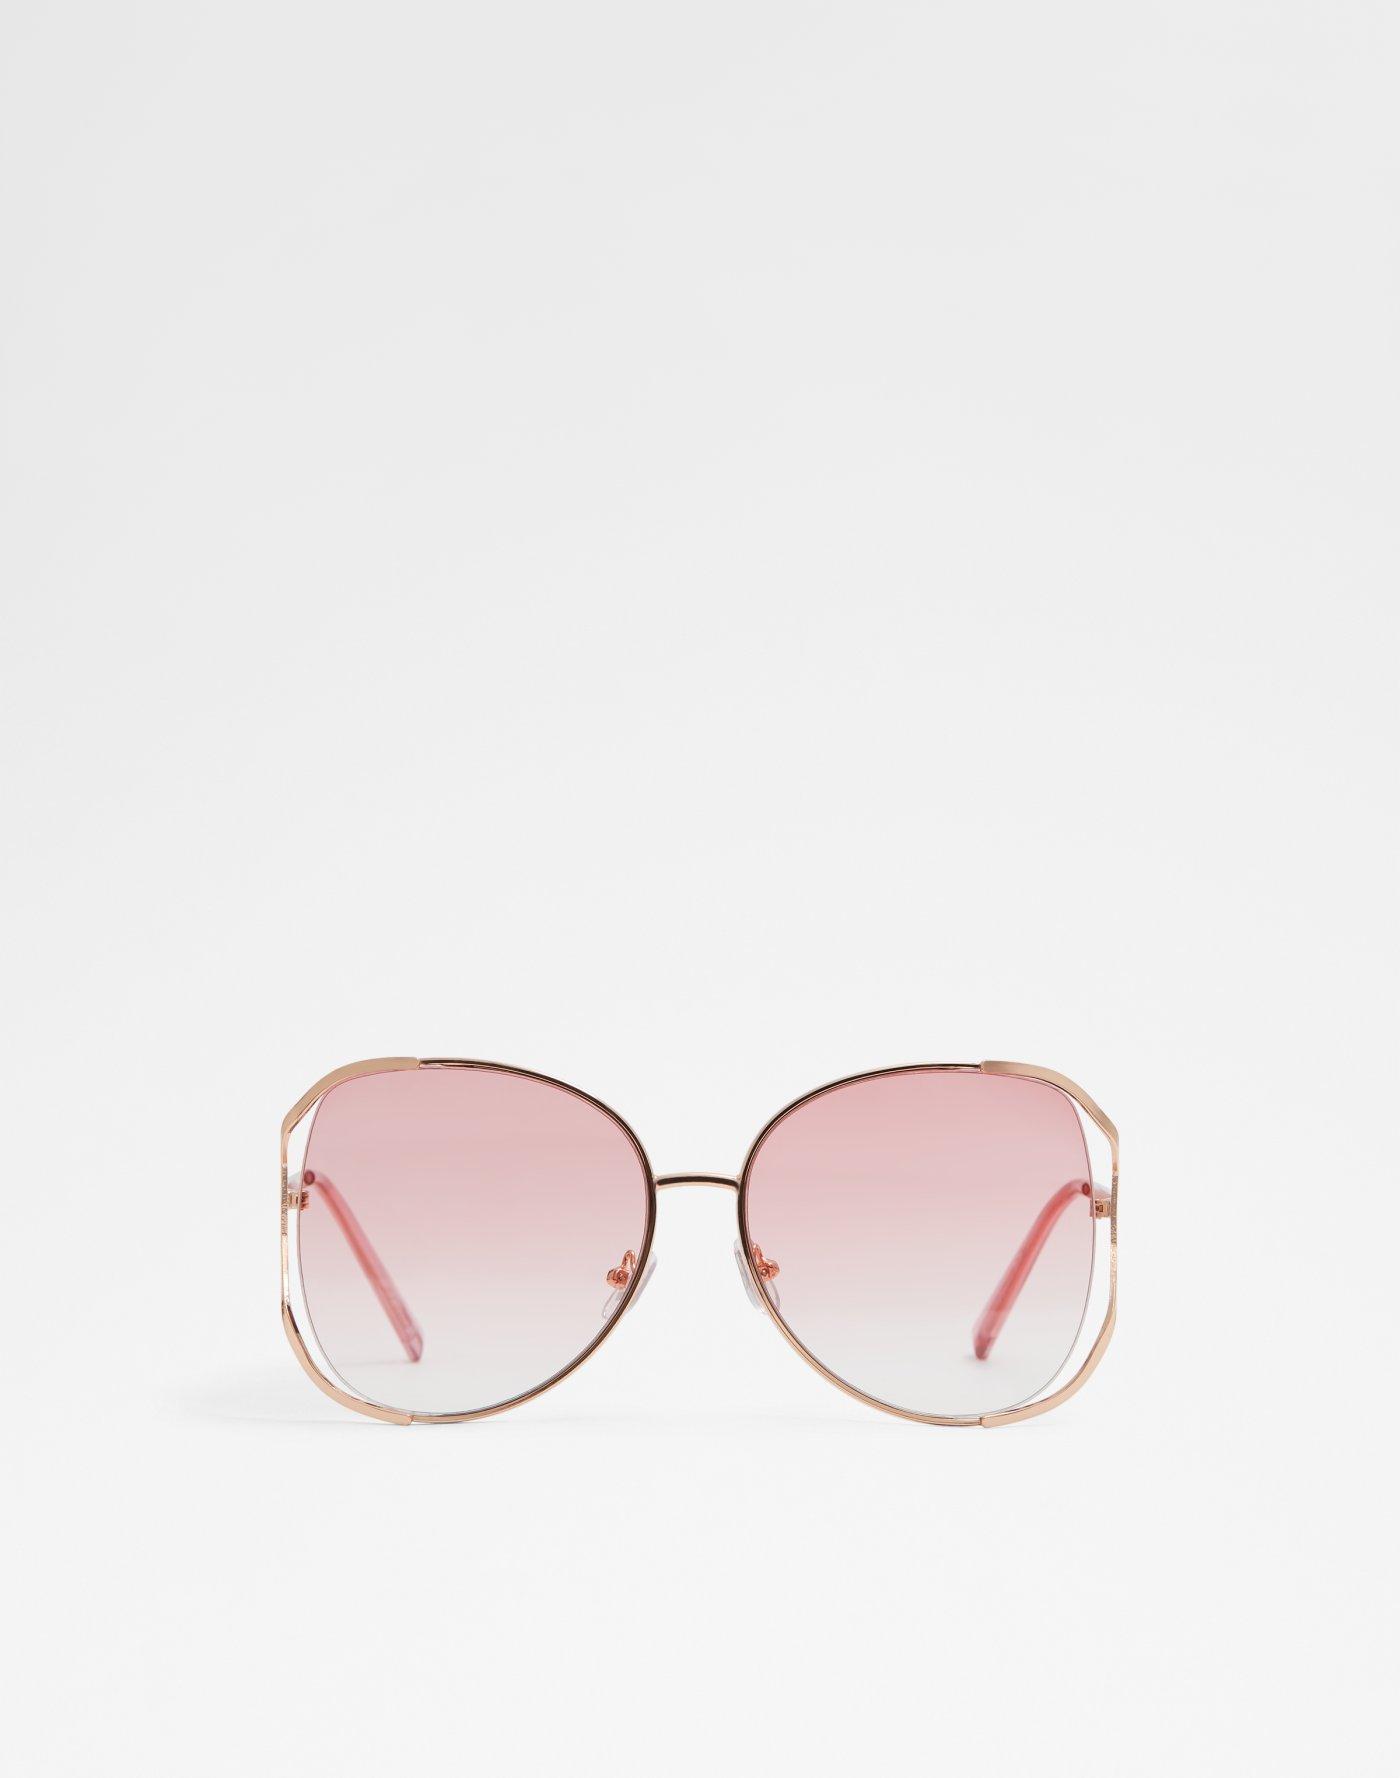 dd025fb7fa Sunglasses